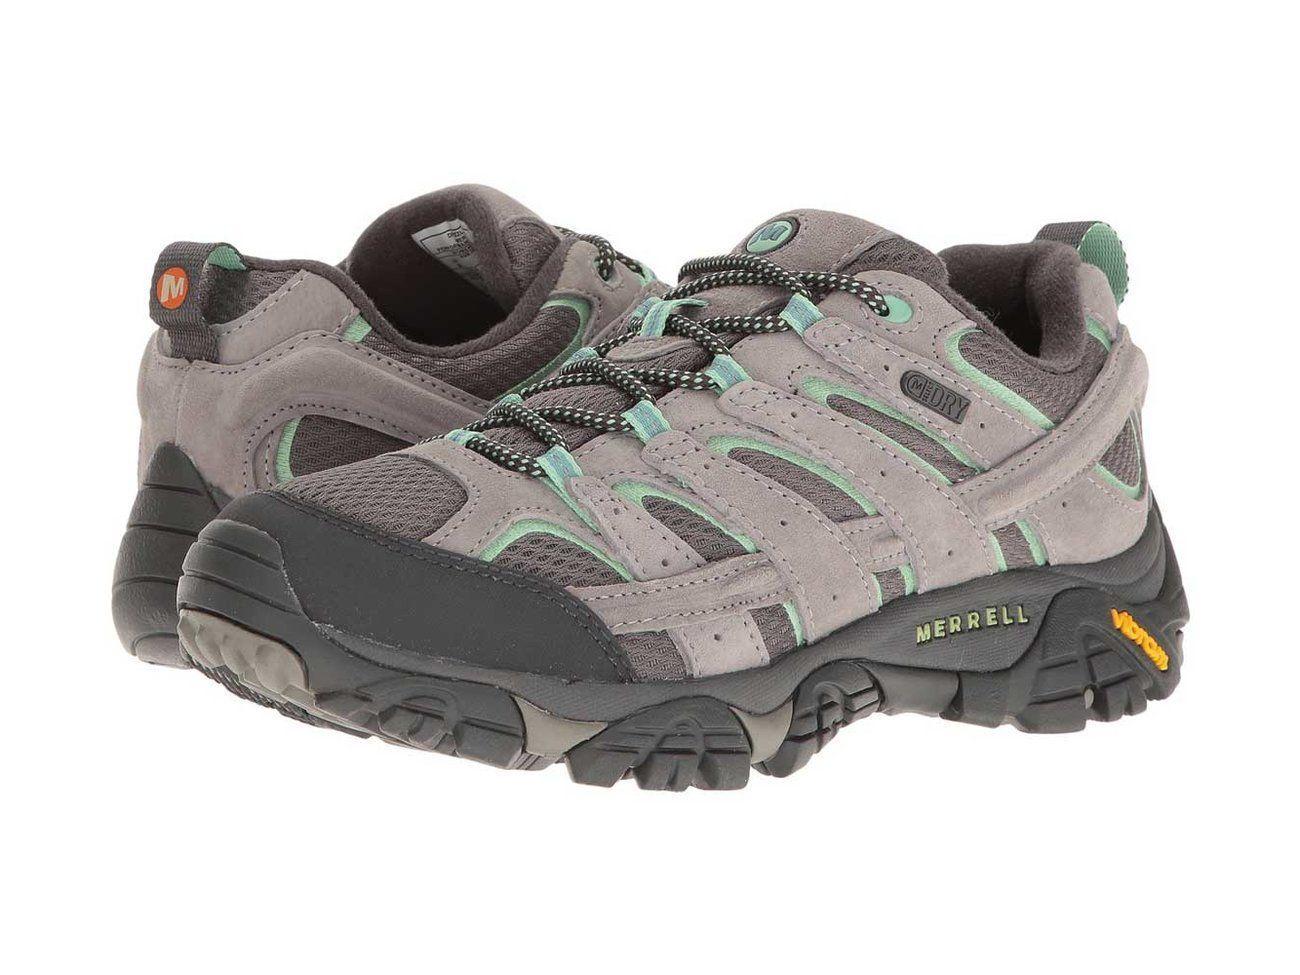 e78d2debb328 Best for Muddy or Wet Trails  Merrell Moab 2 Waterproof Hiking Shoe   besthikingbootswomen